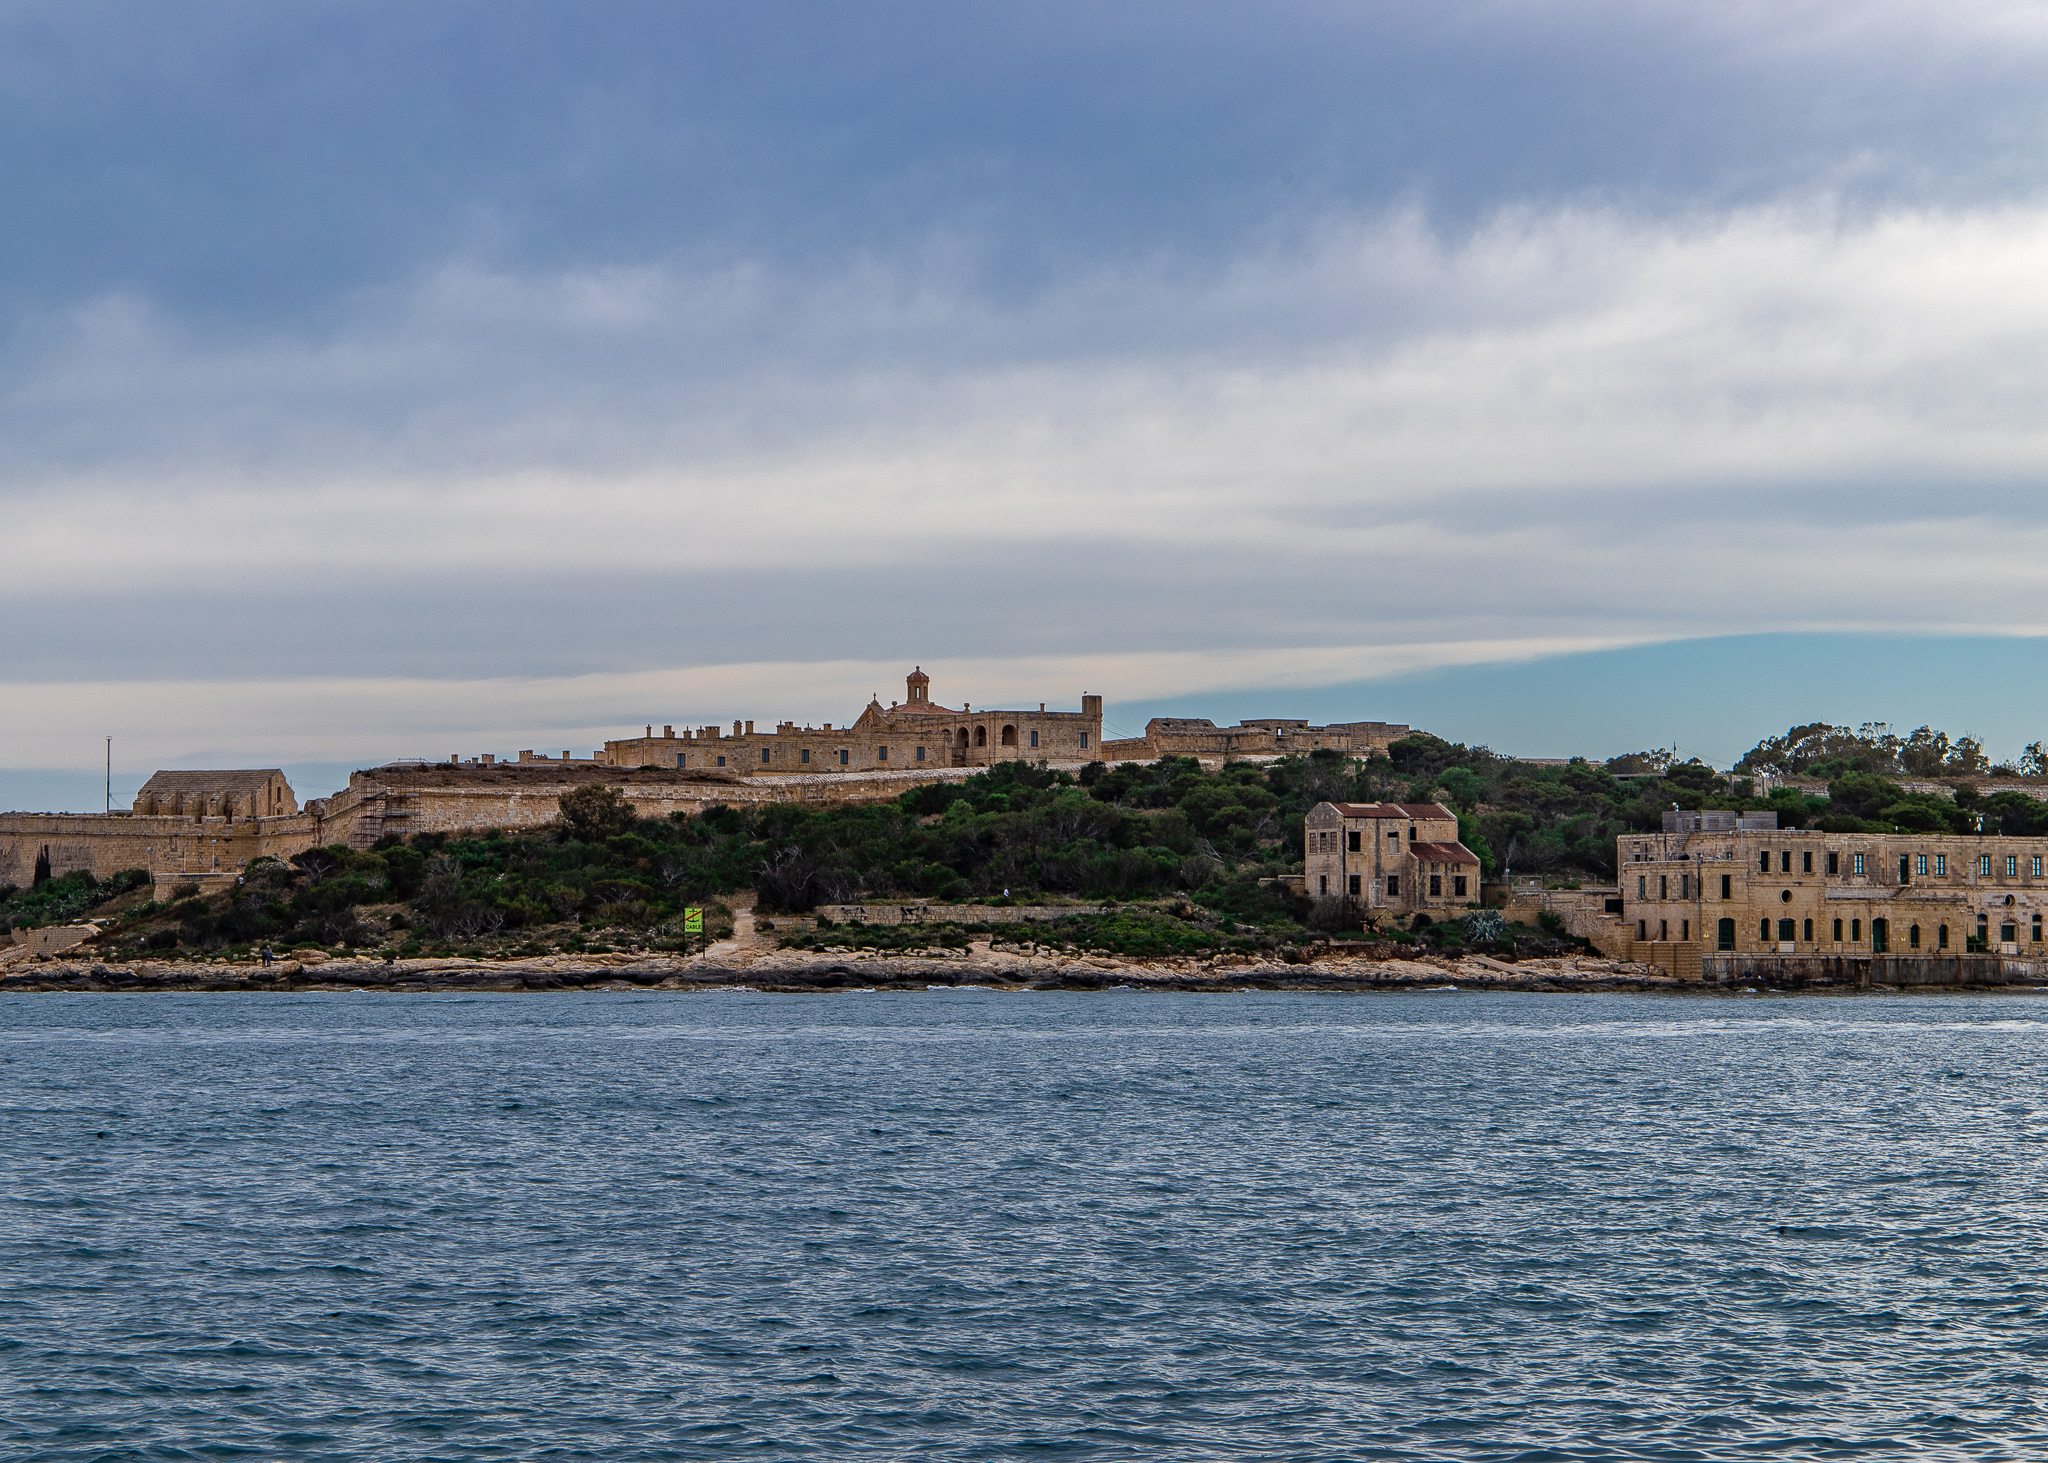 The foreboding Manoel Island